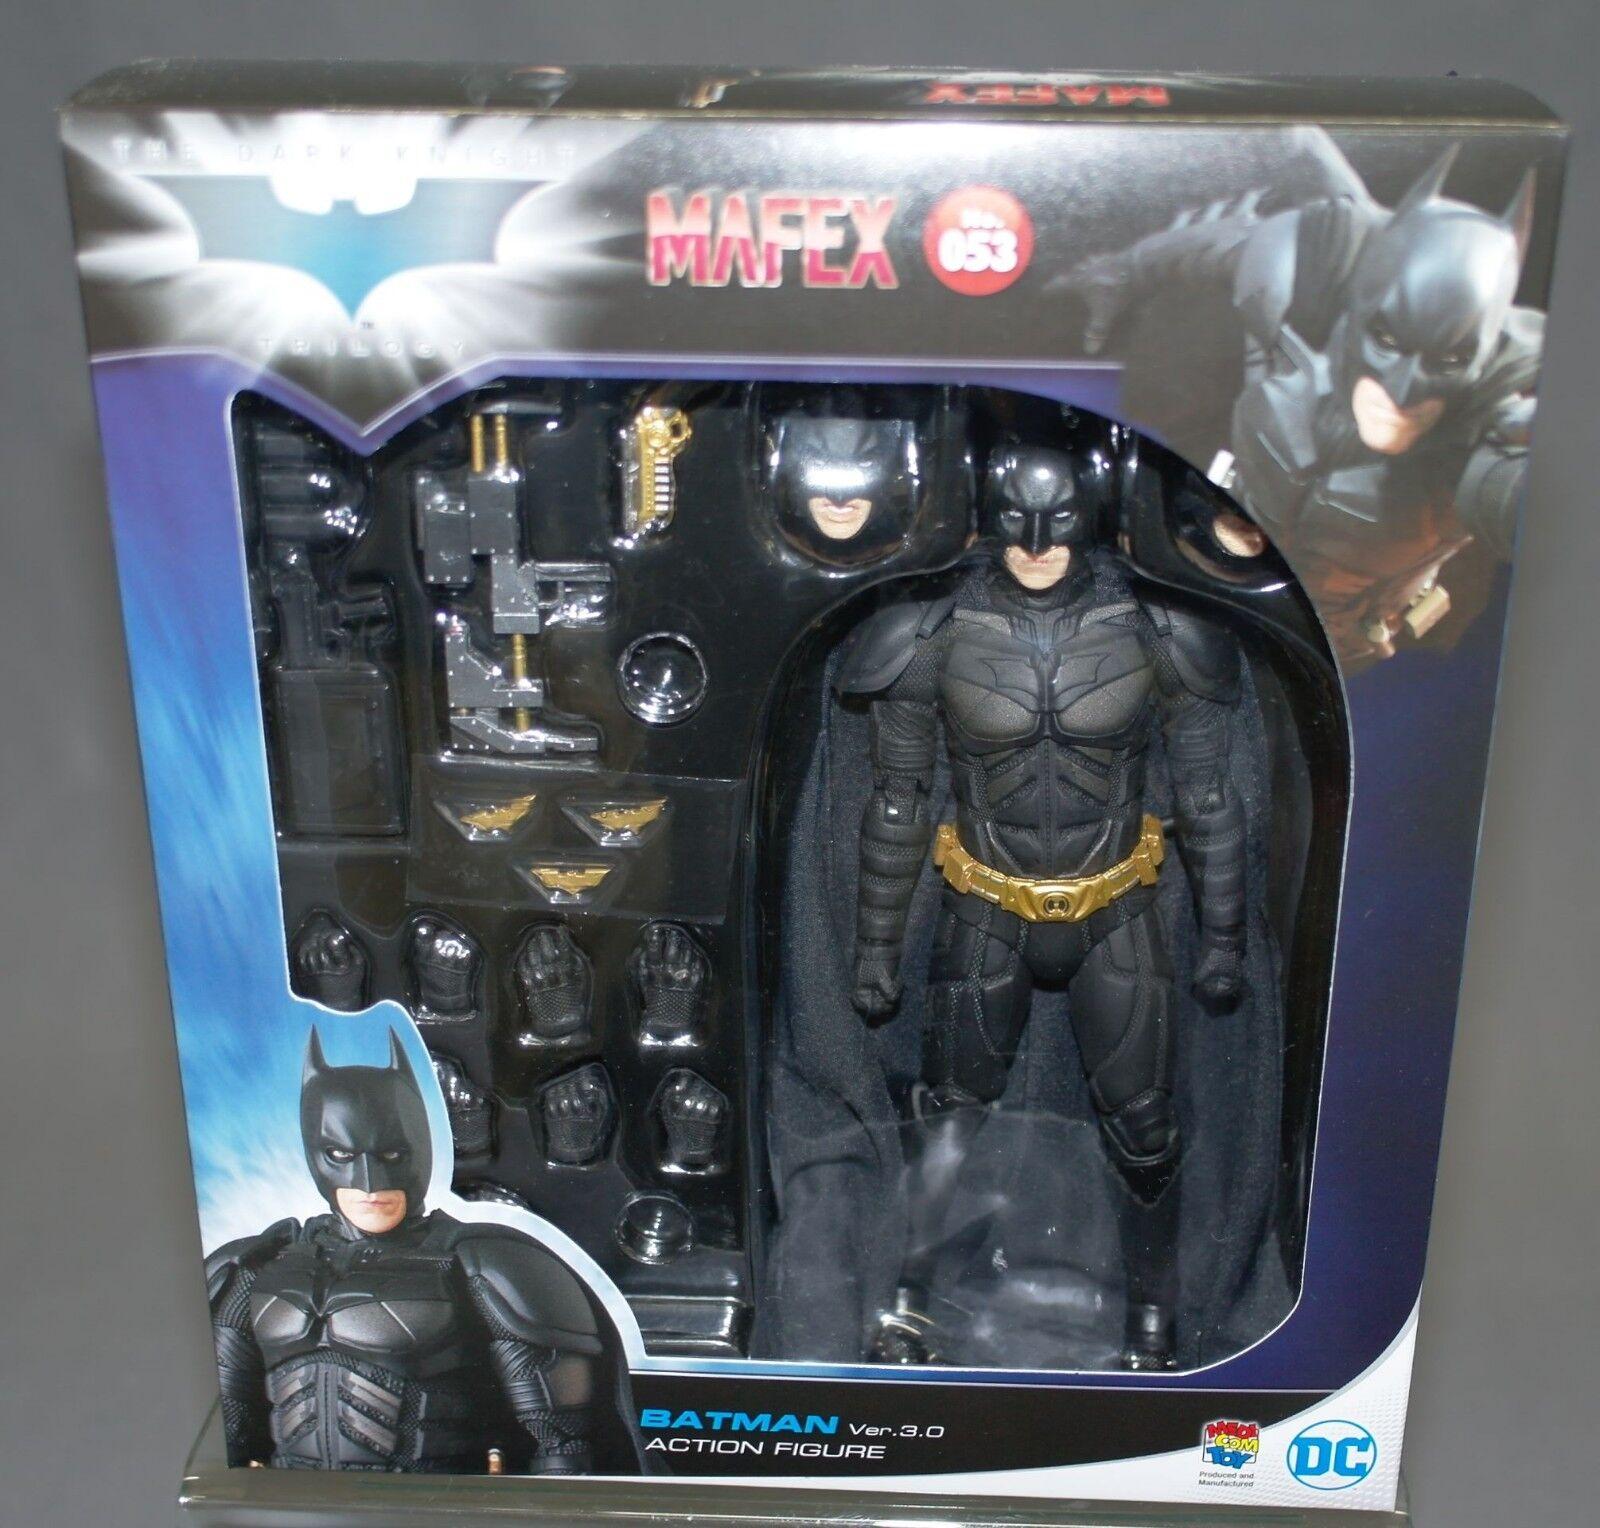 MAFEX No.053 MAFEX BATMAN Ver.3.0 Medicom Toy JAPAN NEW